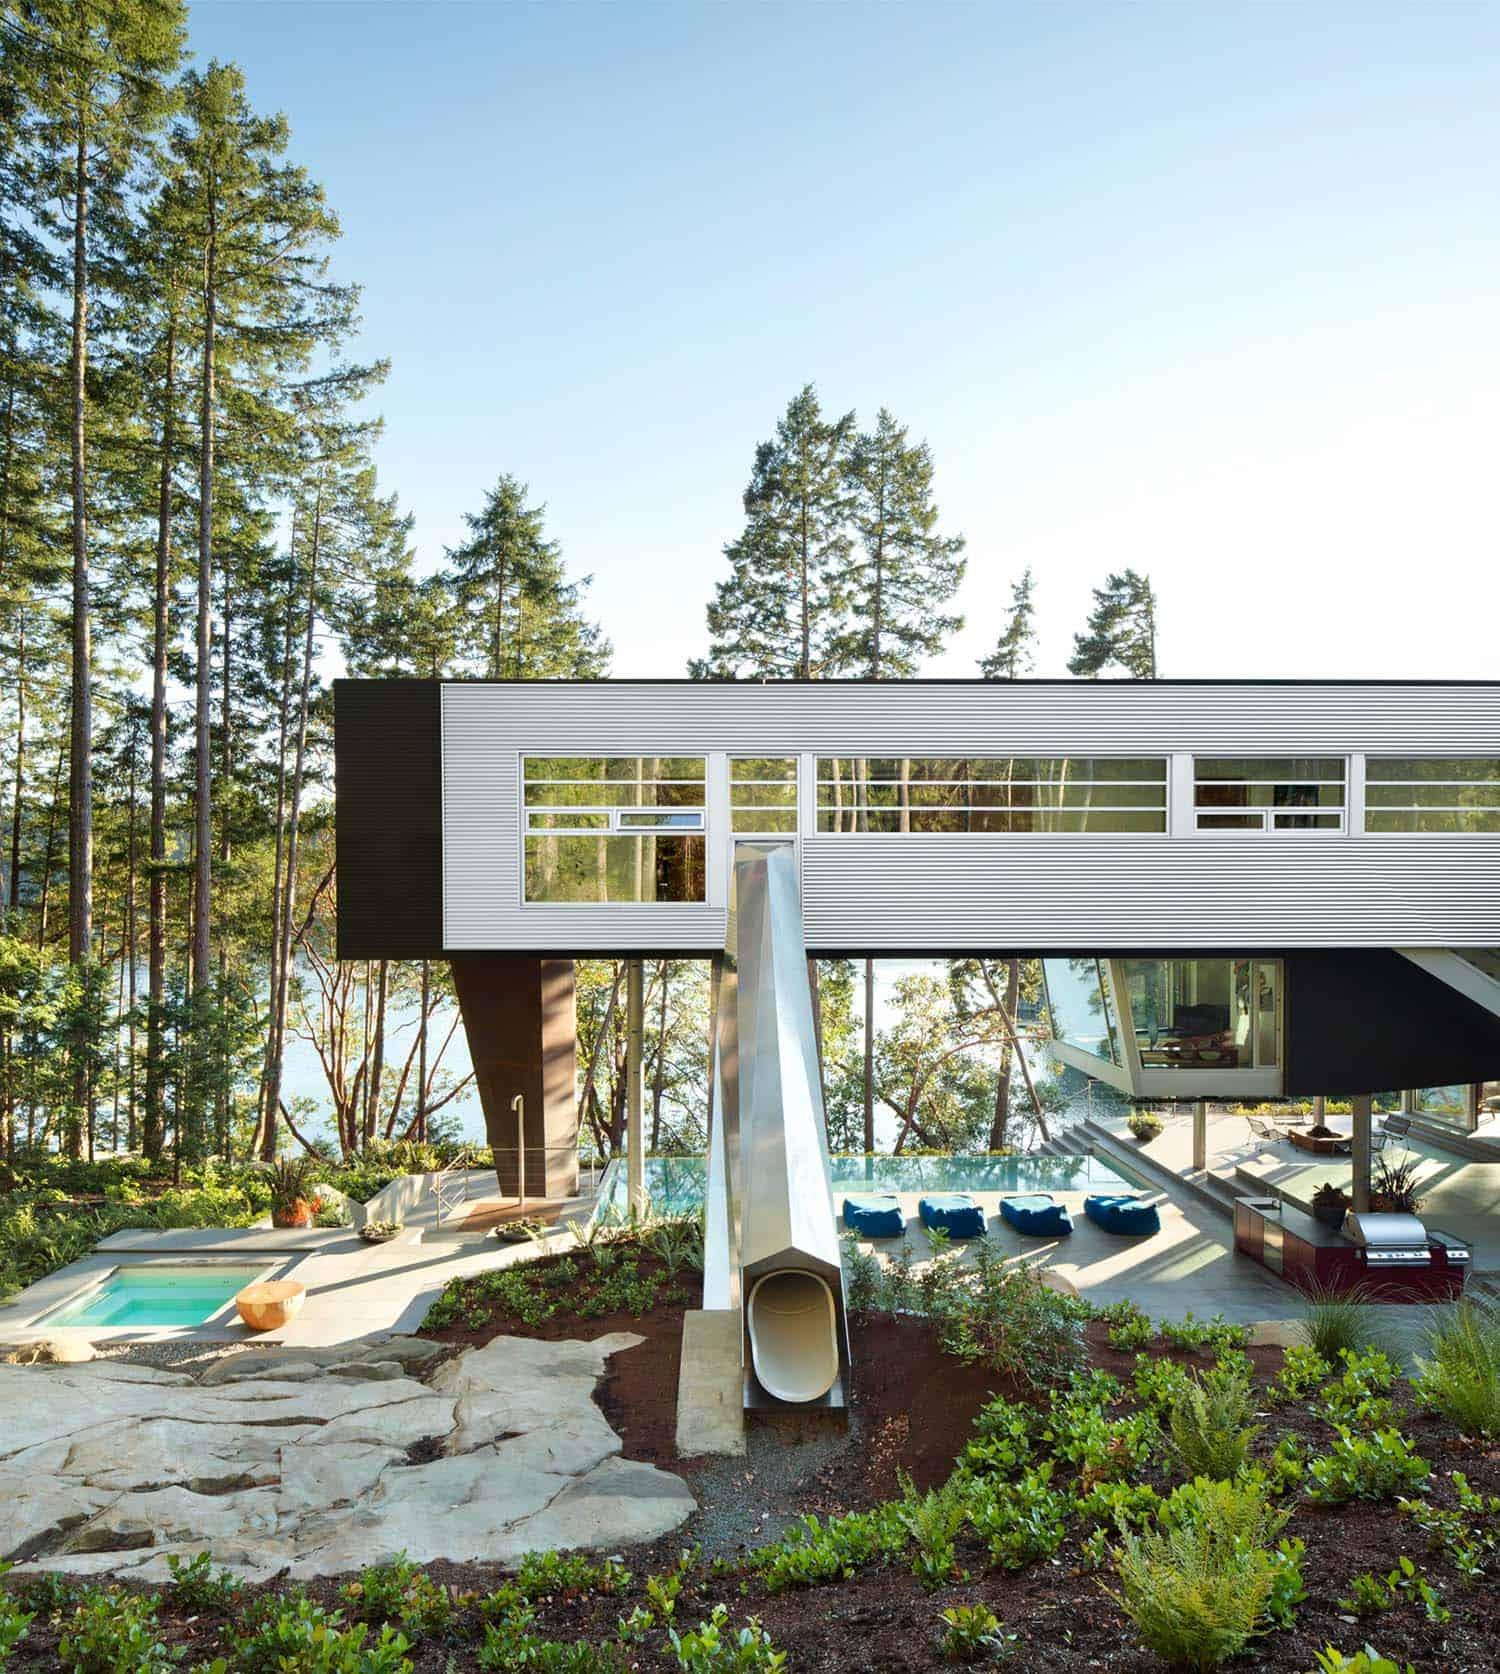 Gulf Islands Residence-AA Robins Architect-25-1 Kindesign